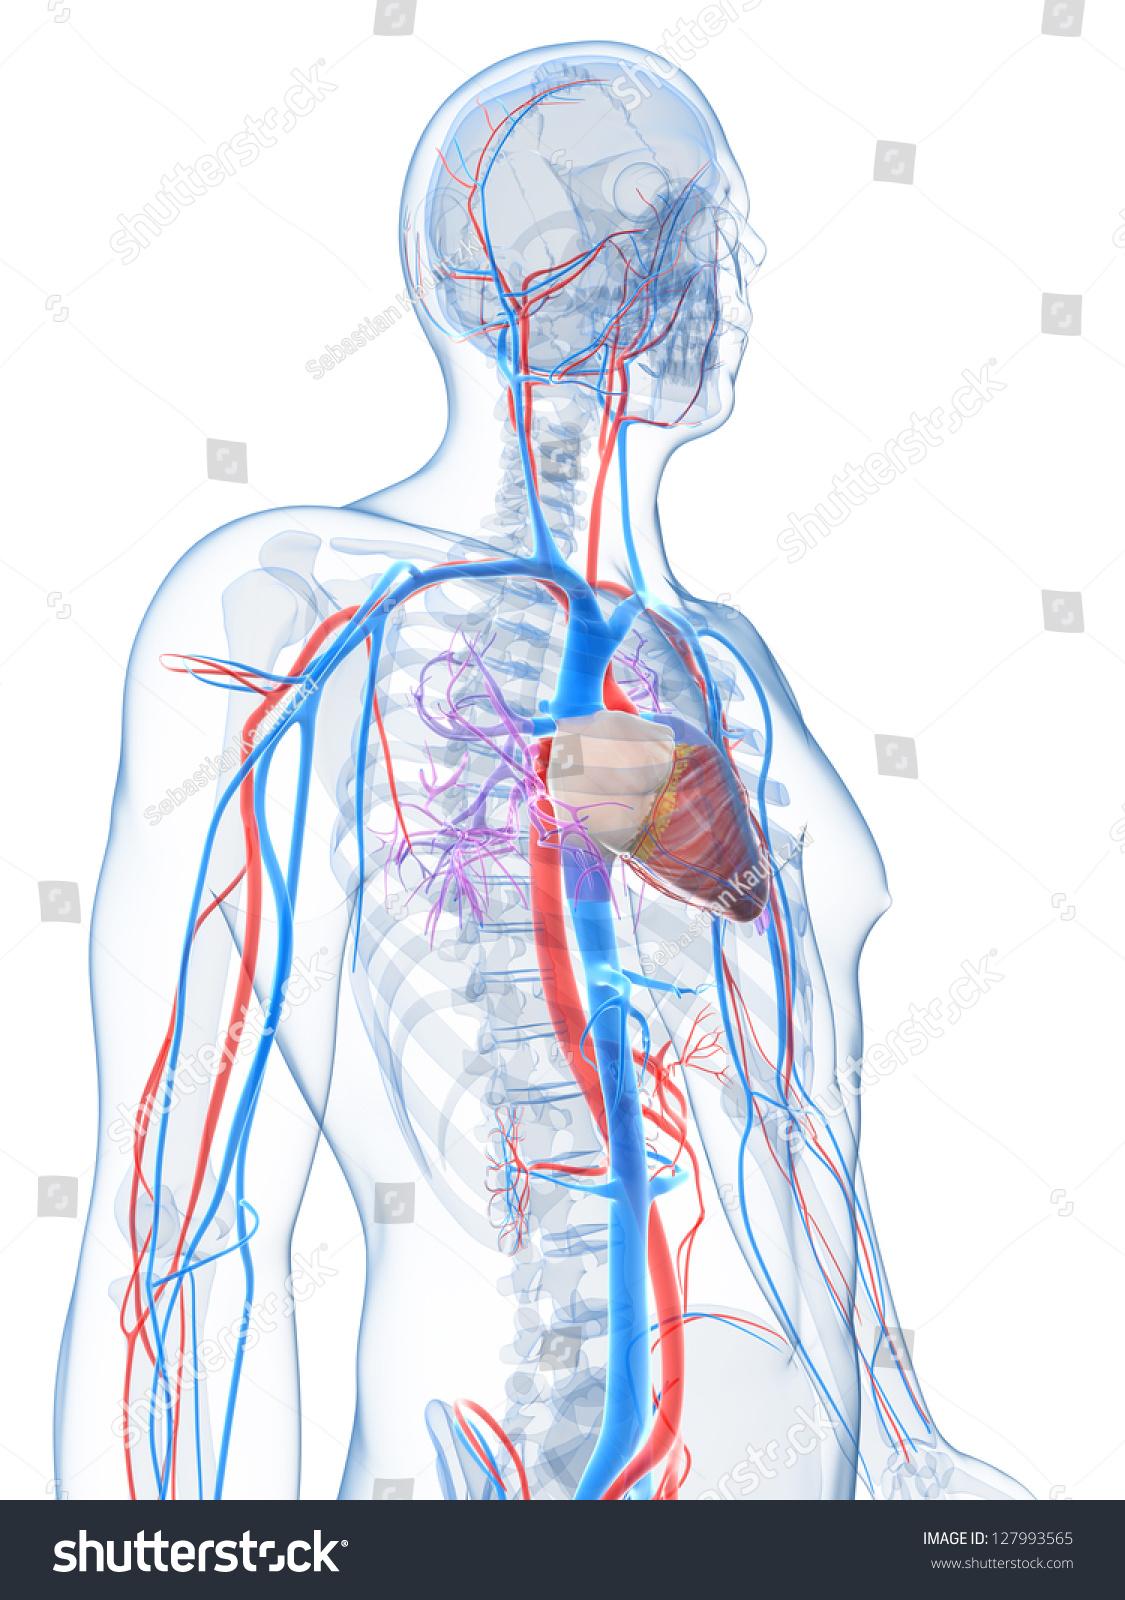 3 D Rendered Illustration Human Vascular System Stock Illustration